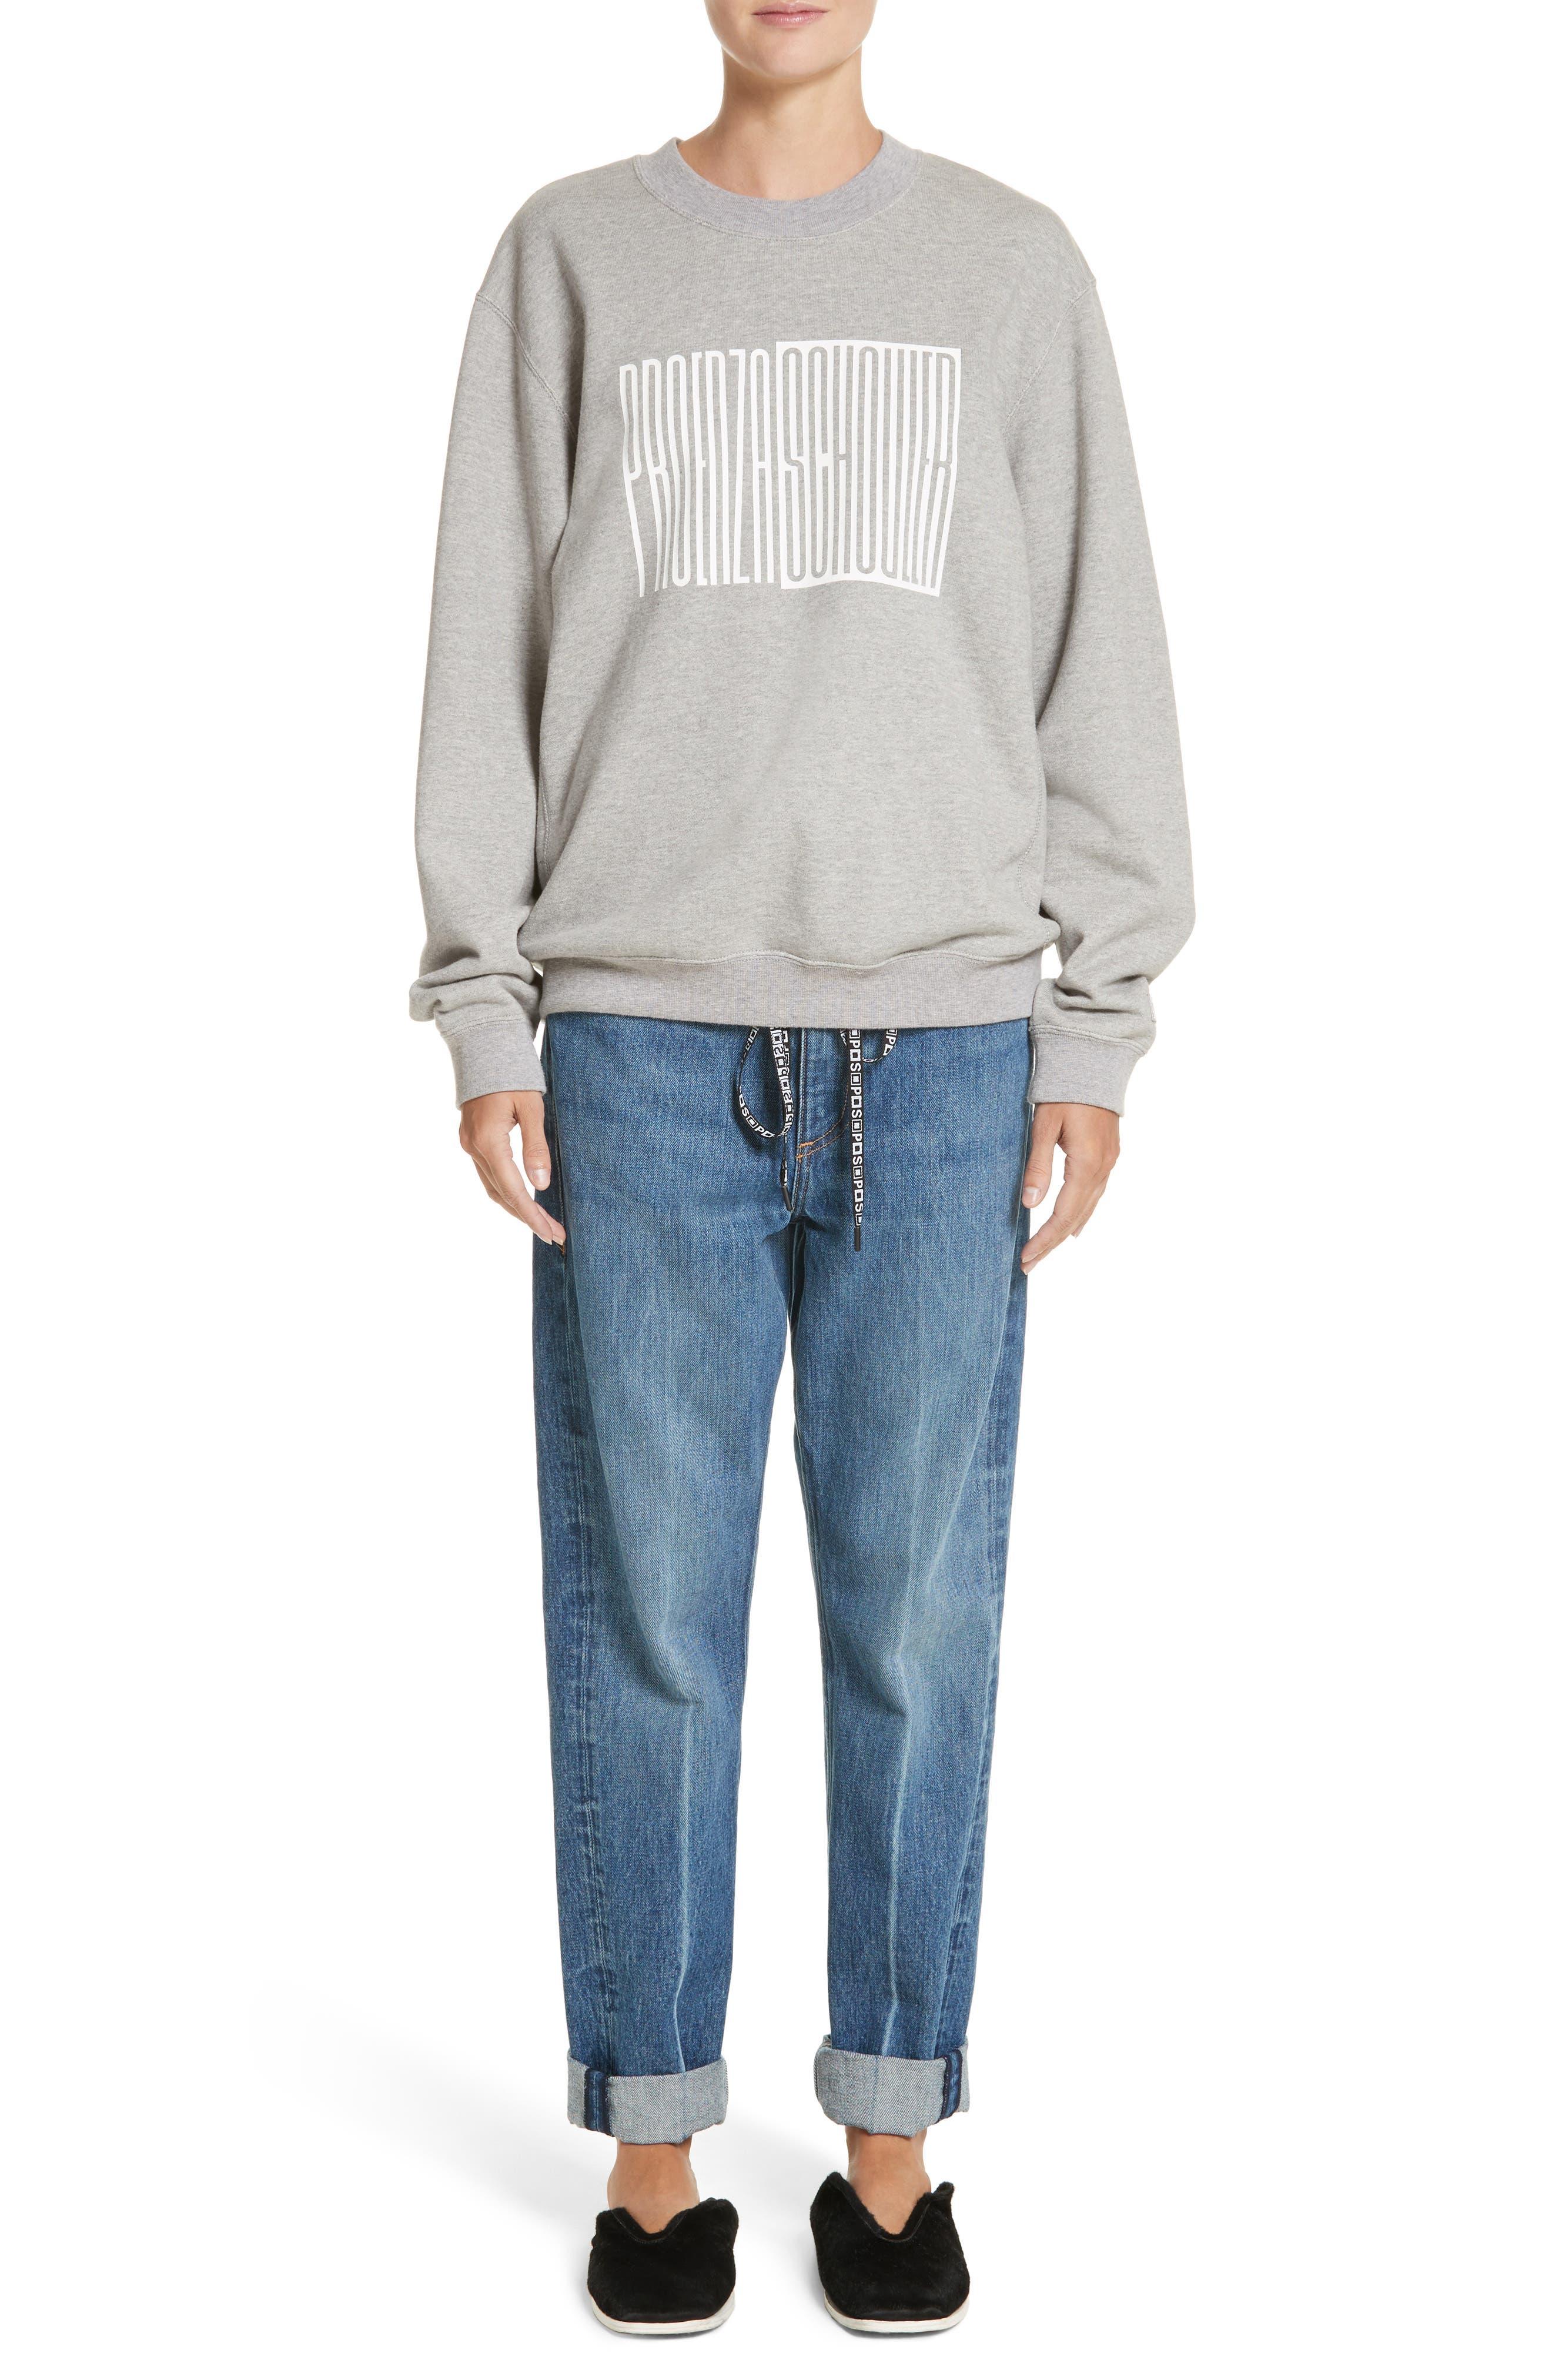 PSWL Cuffed Straight Leg Jeans,                             Alternate thumbnail 11, color,                             Medium Blue